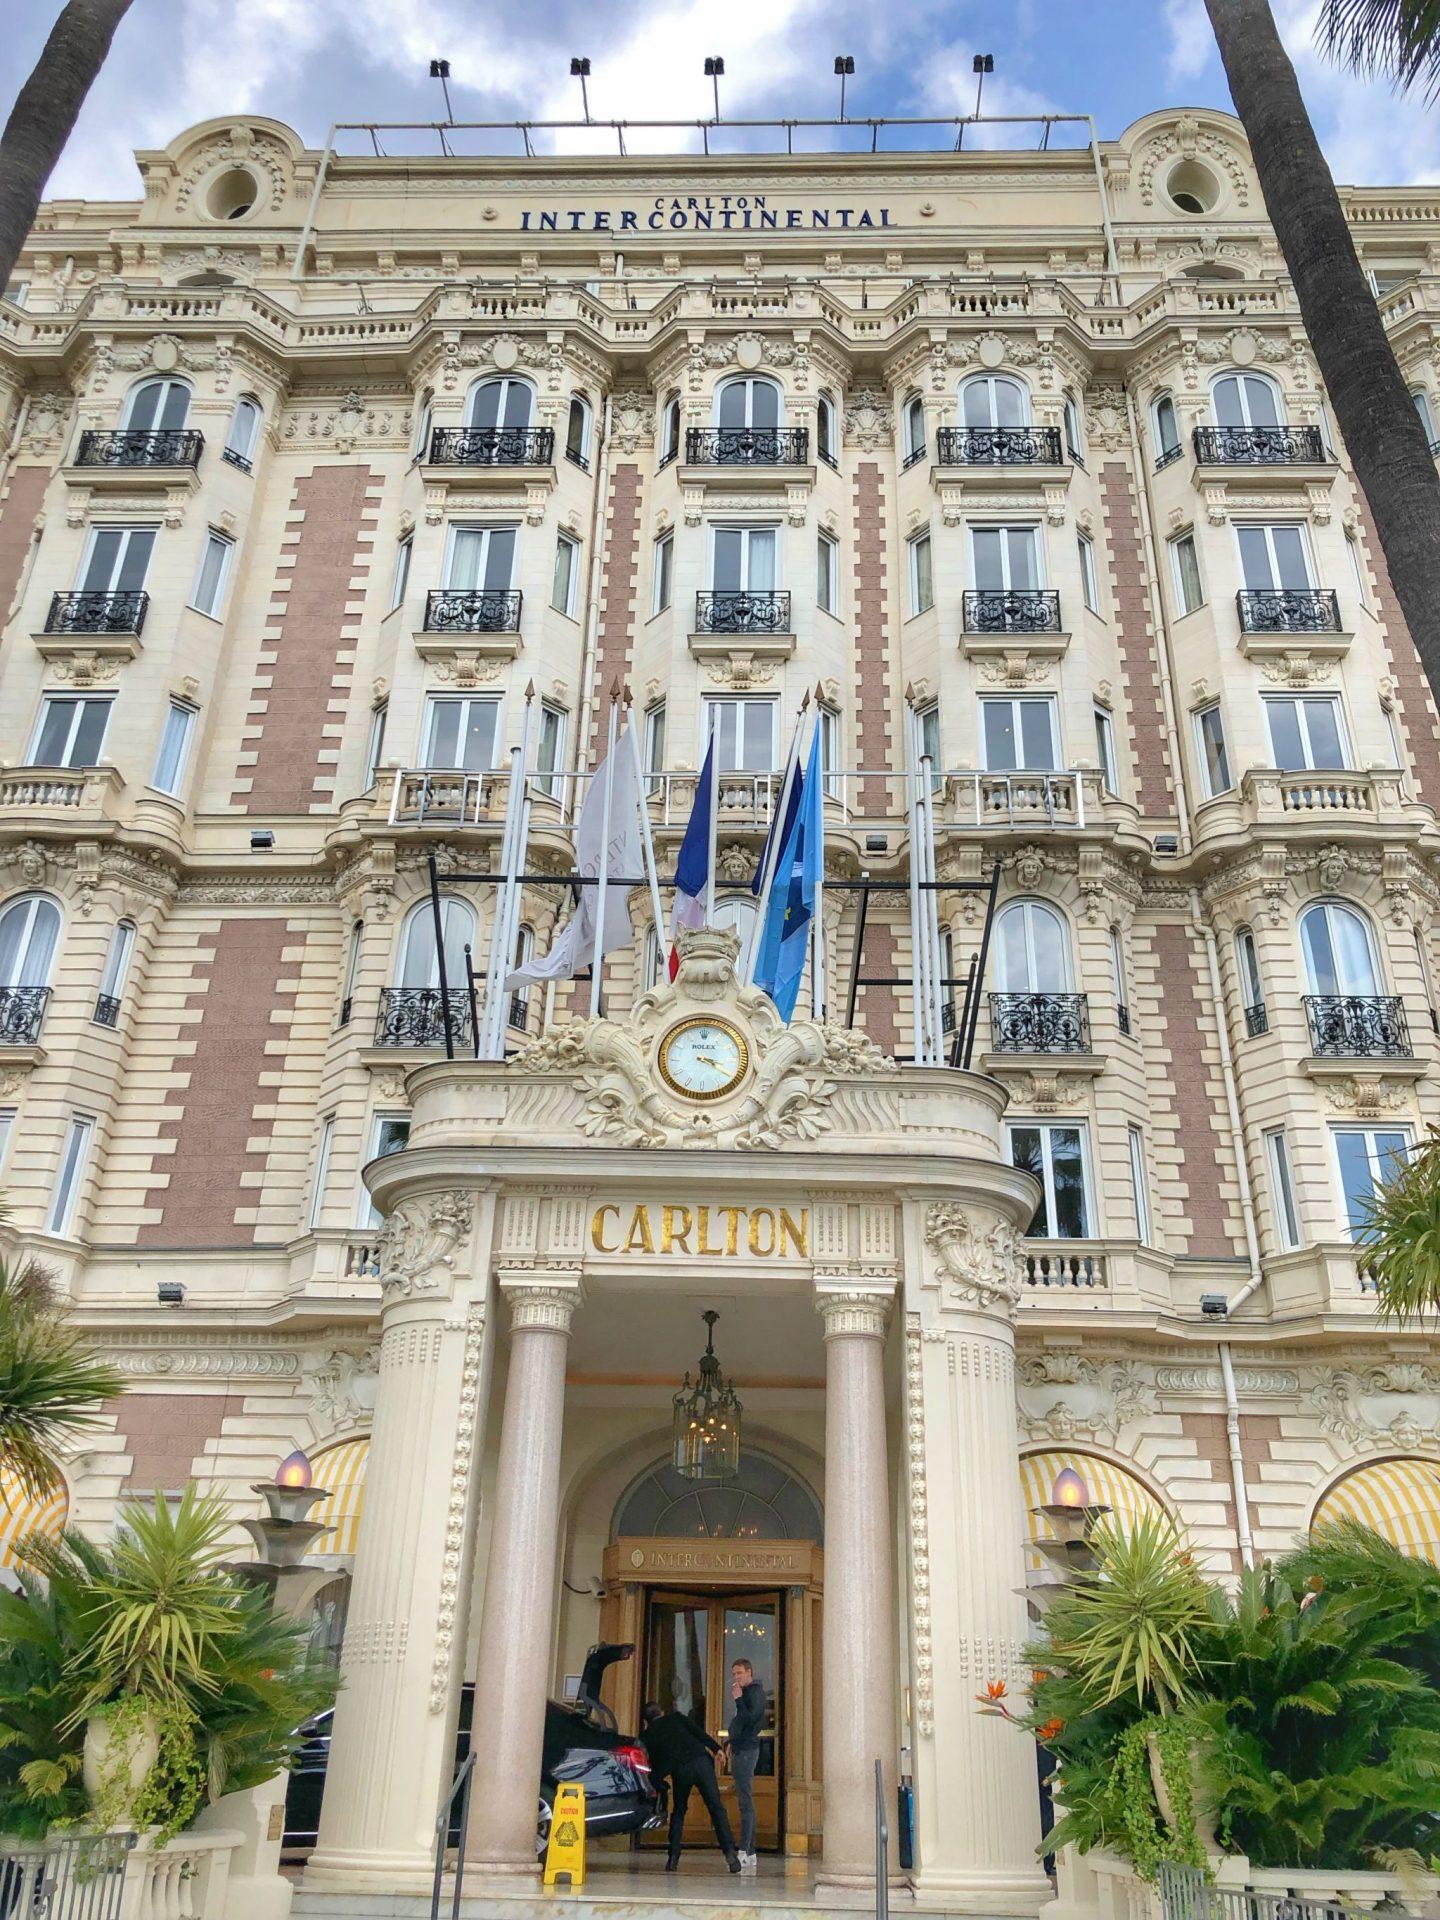 Carlton Intercontinental France